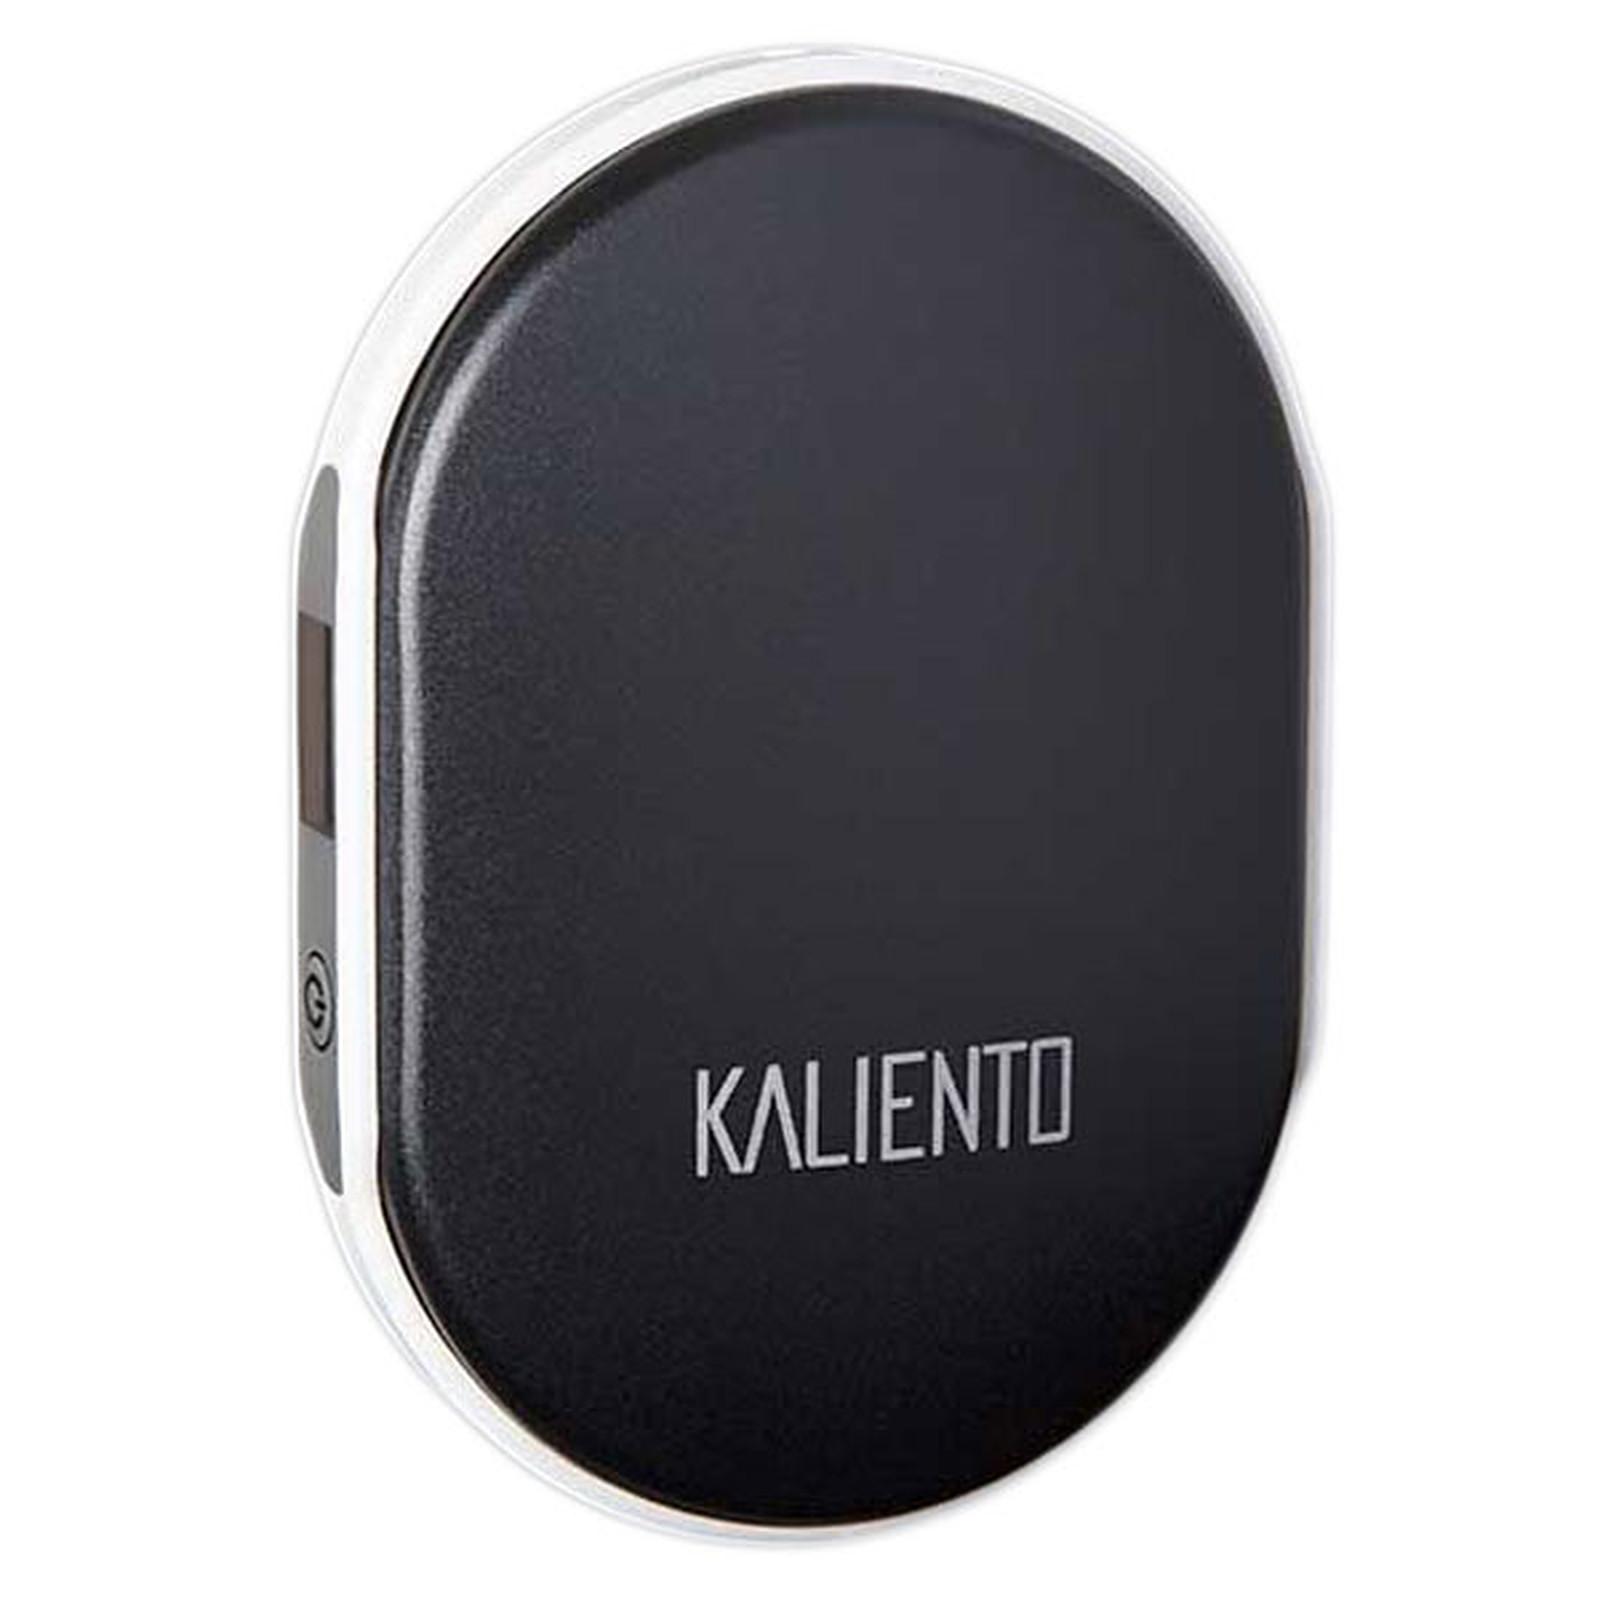 Bequipe Kaliento (Noir)